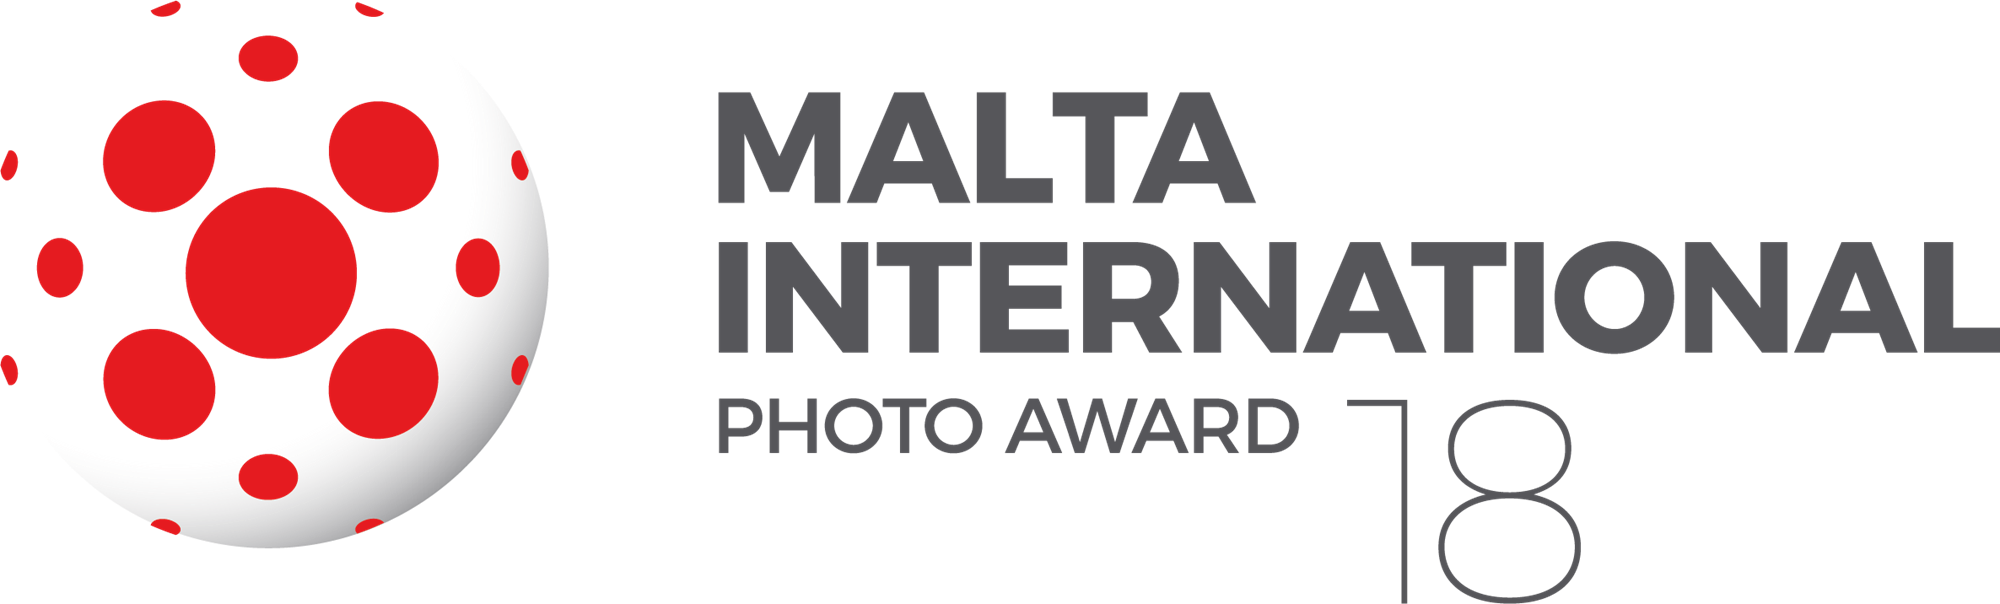 Malta International Photo Award 2018 - logo